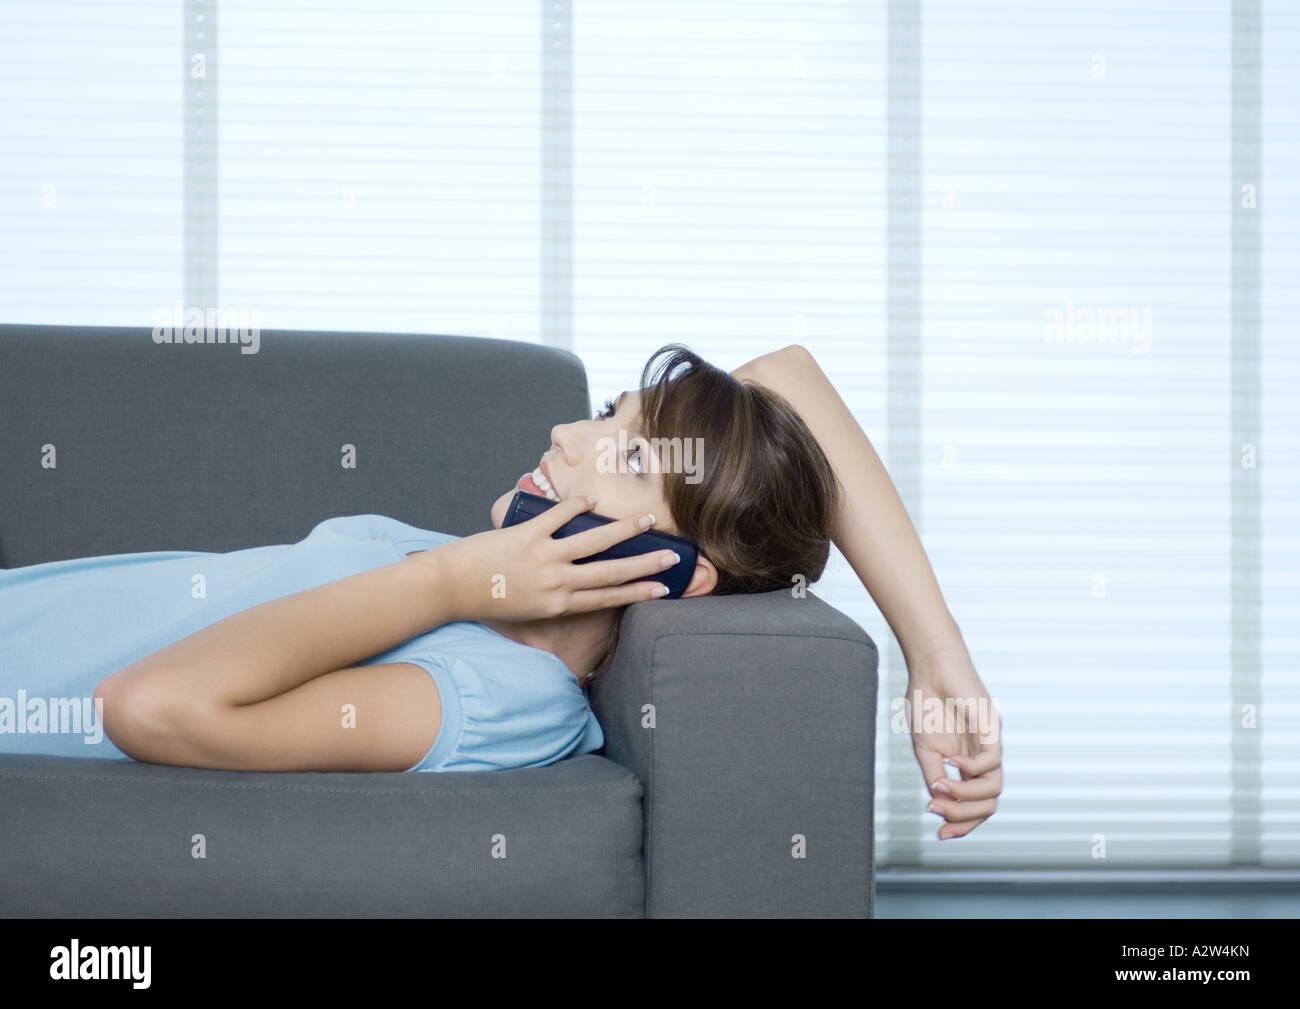 Woman lying on sofa, talking on phone - Stock Image